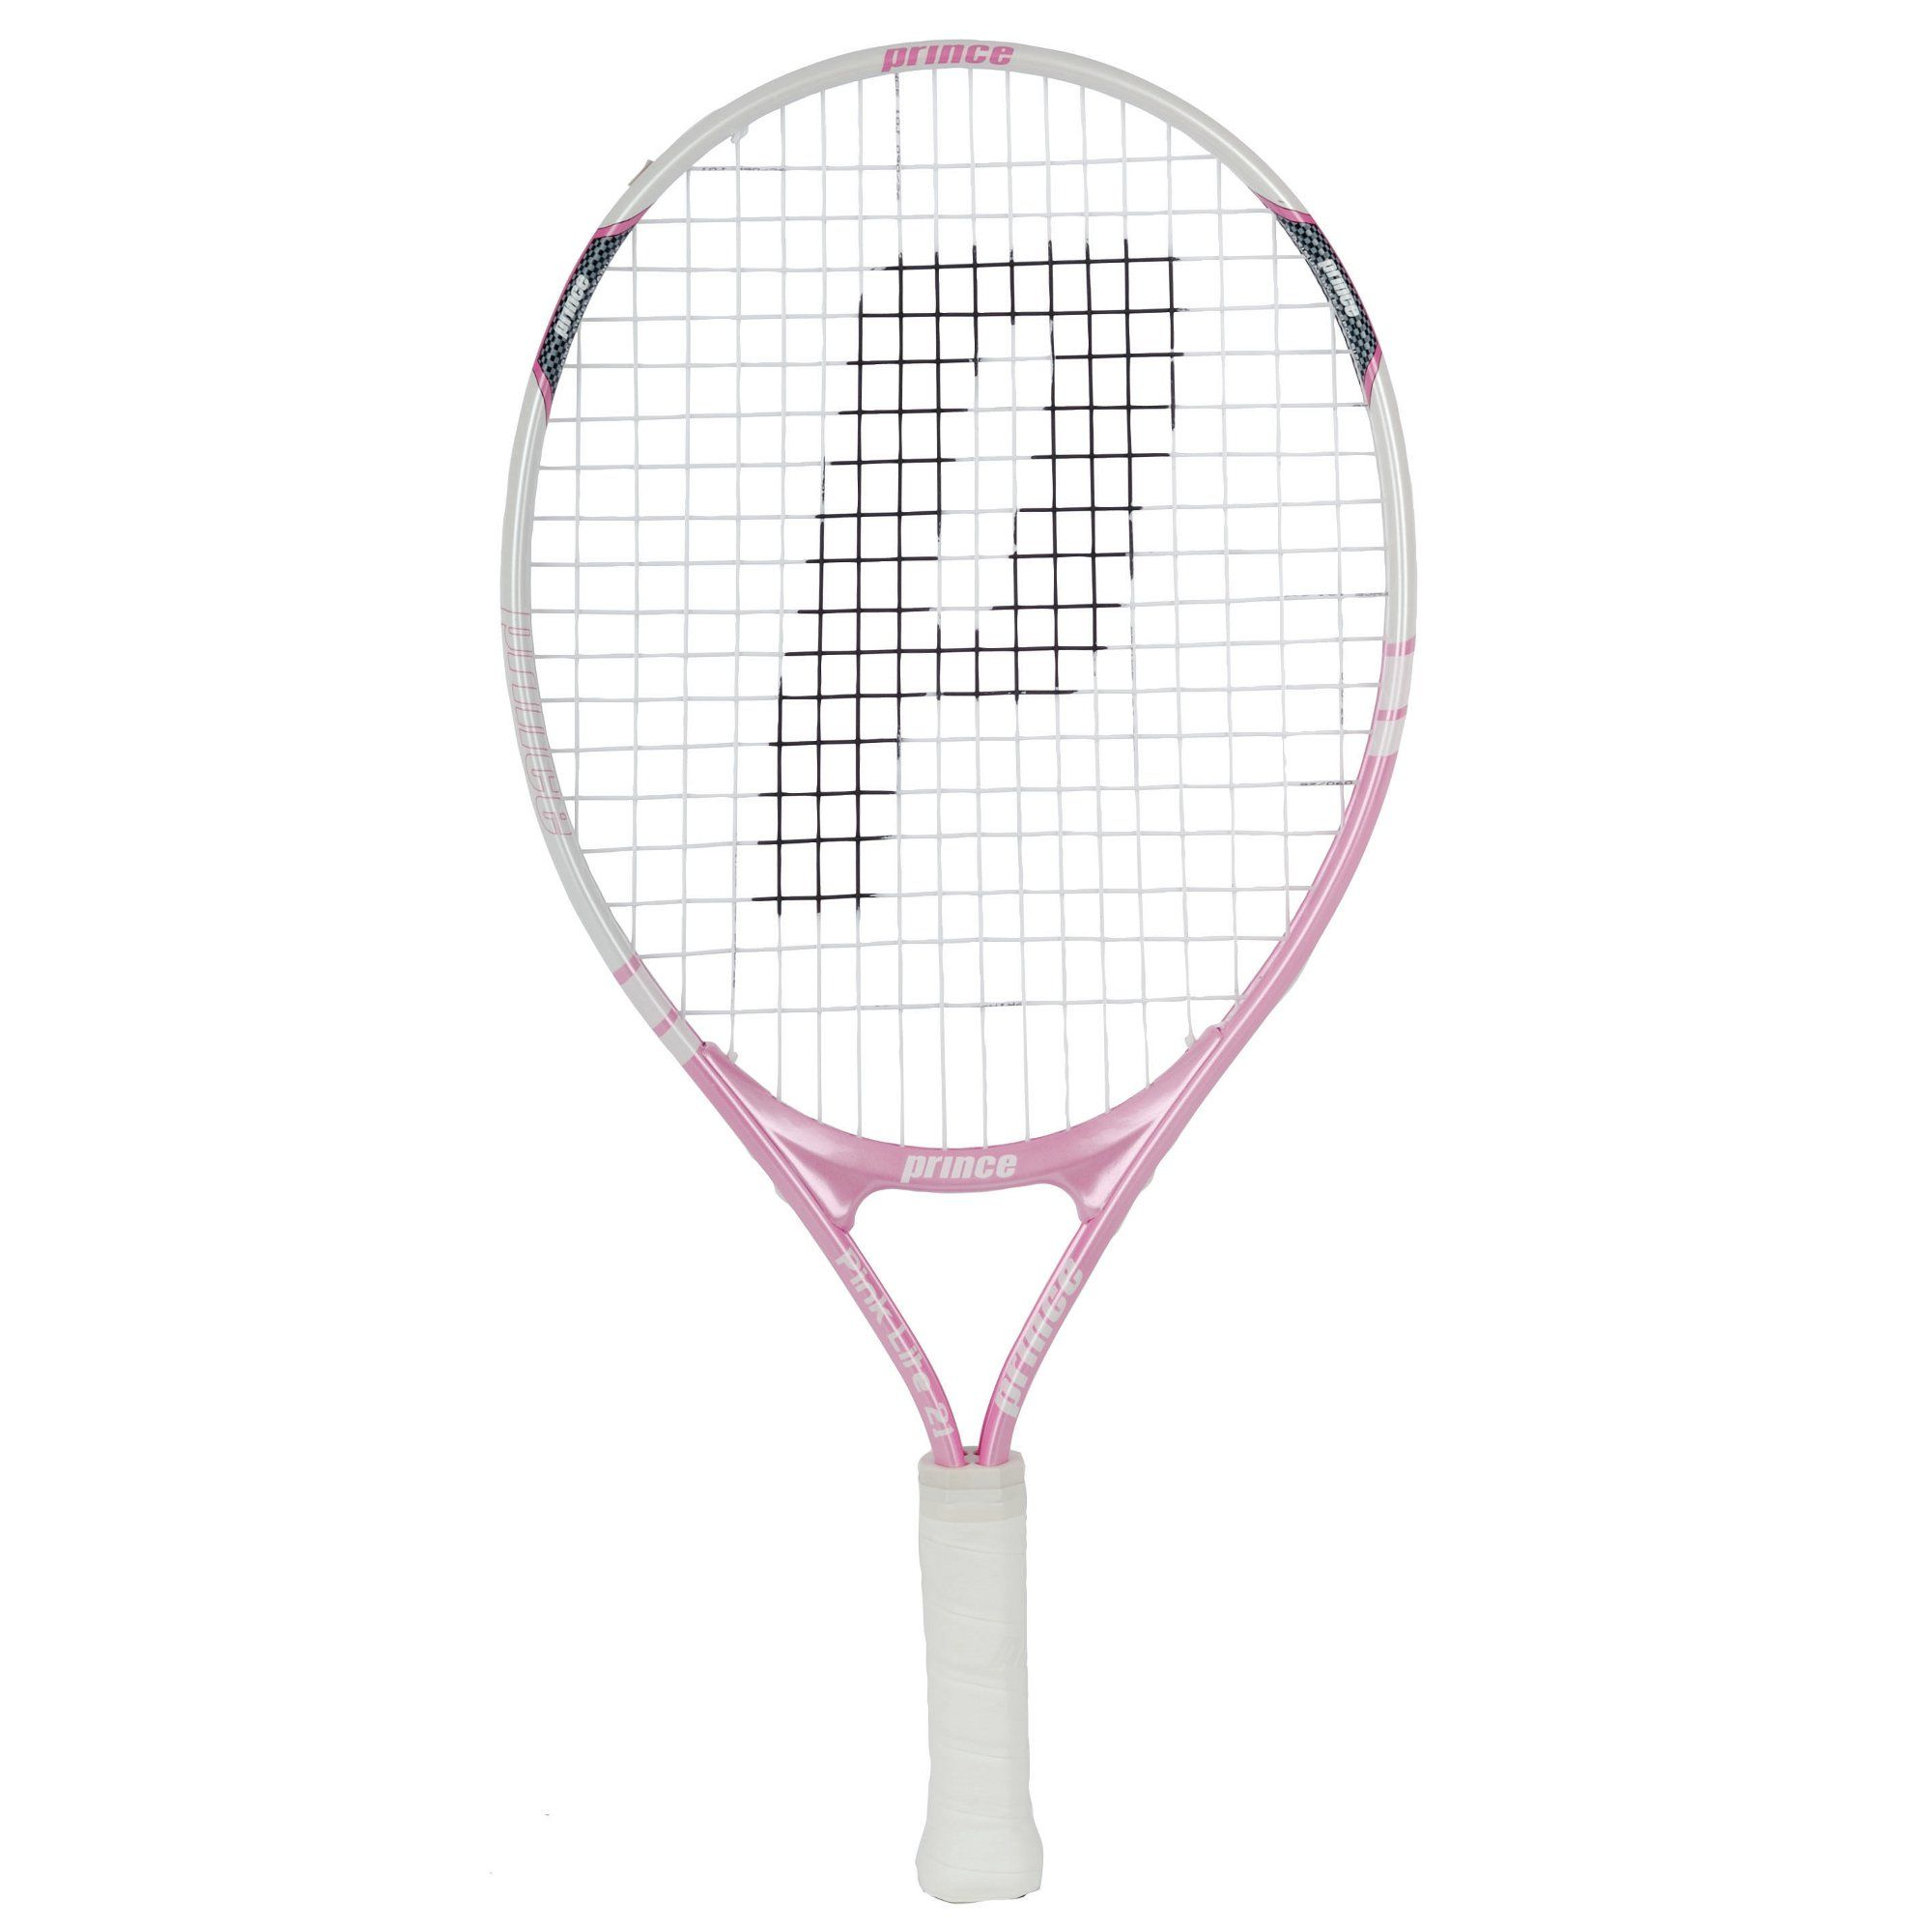 Prince Pink Lite 21 Junior Tennis Racket - Sweatband.com